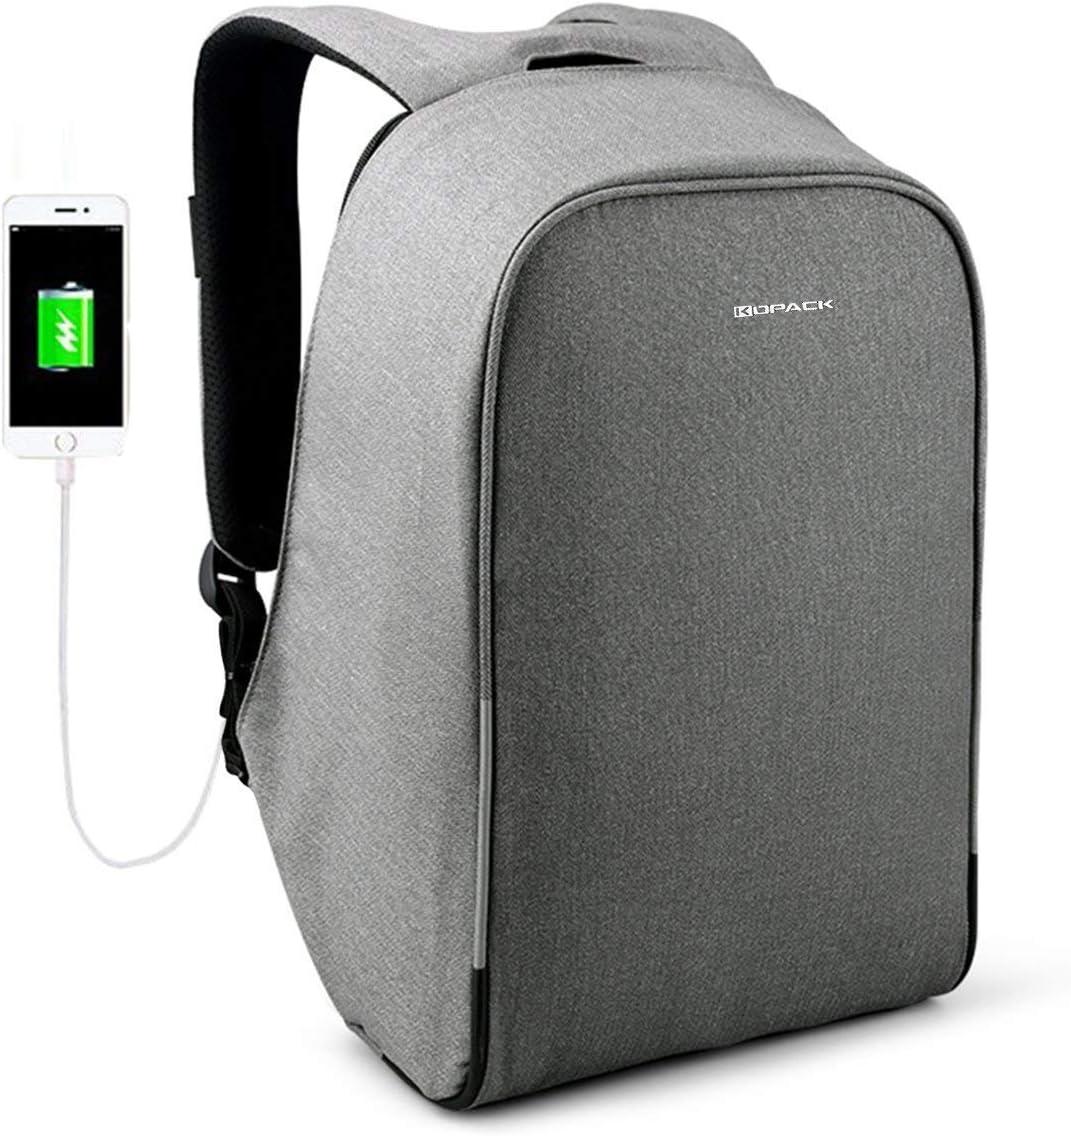 KOPACK Waterproof Anti-Thief Laptop Backpack USB Charging Port Business Travel Backpack Bag Men Women Rain Cover 15.6 Inch Grey